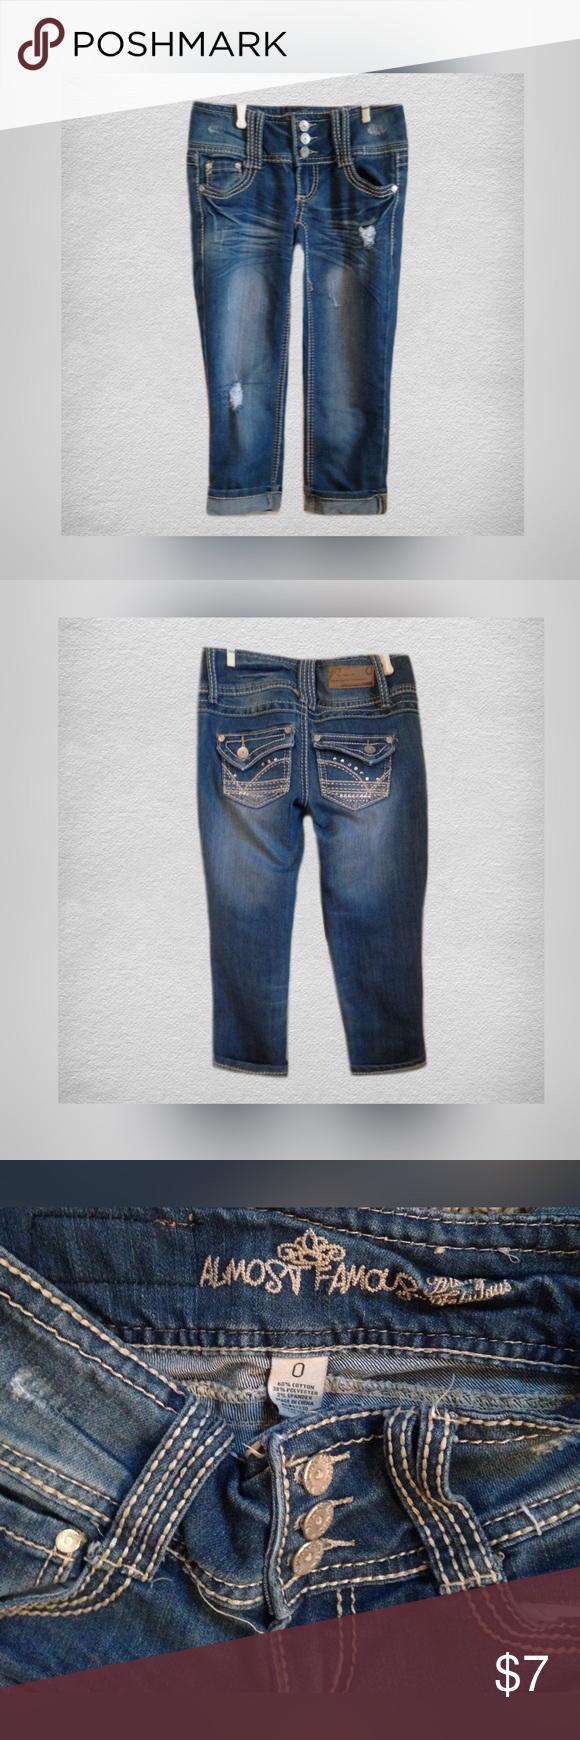 ‼️30% OFF BUNDLES‼️ALMOST FAMOUS Capris Gently used ALMOST FAMOUS cropped jeans; Size 0 Almost Famous Jeans Ankle & Cropped